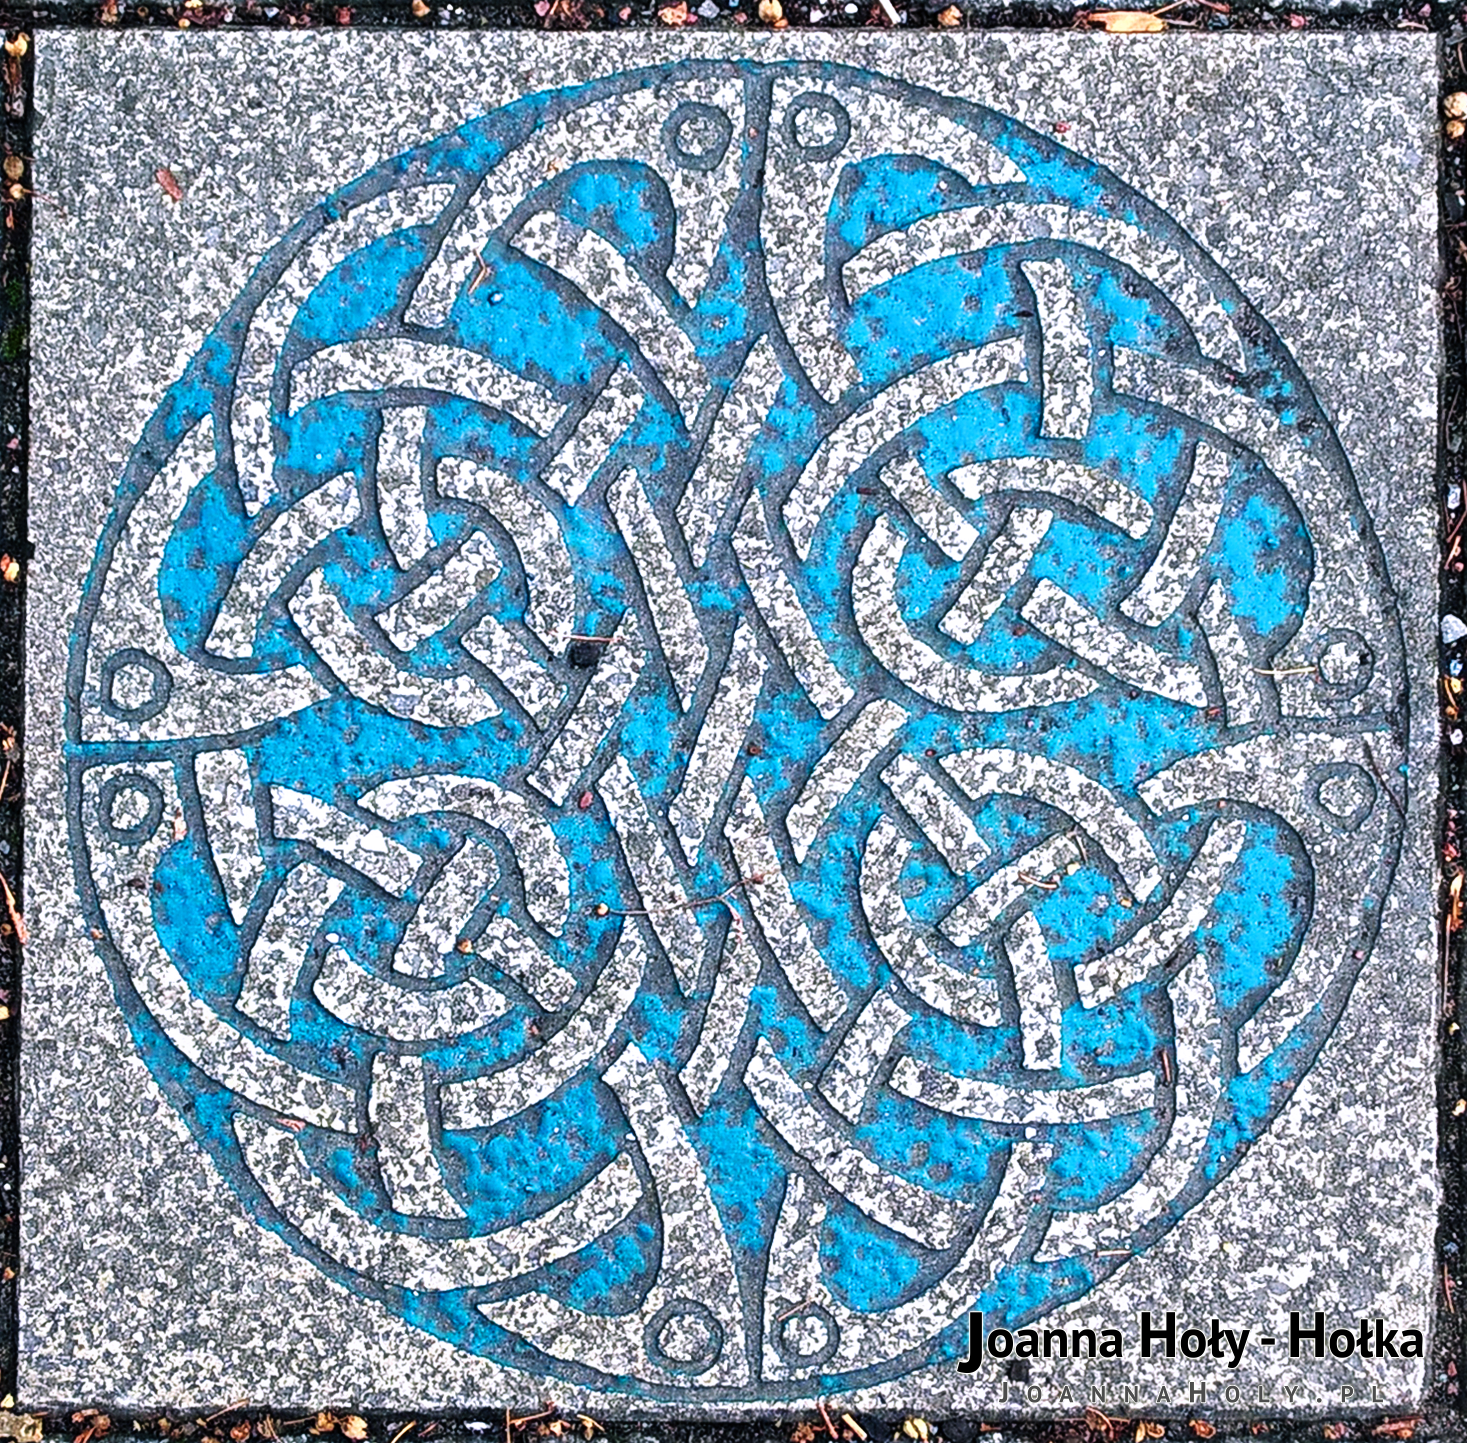 Cardiff Bute St artistic pavement flagstone